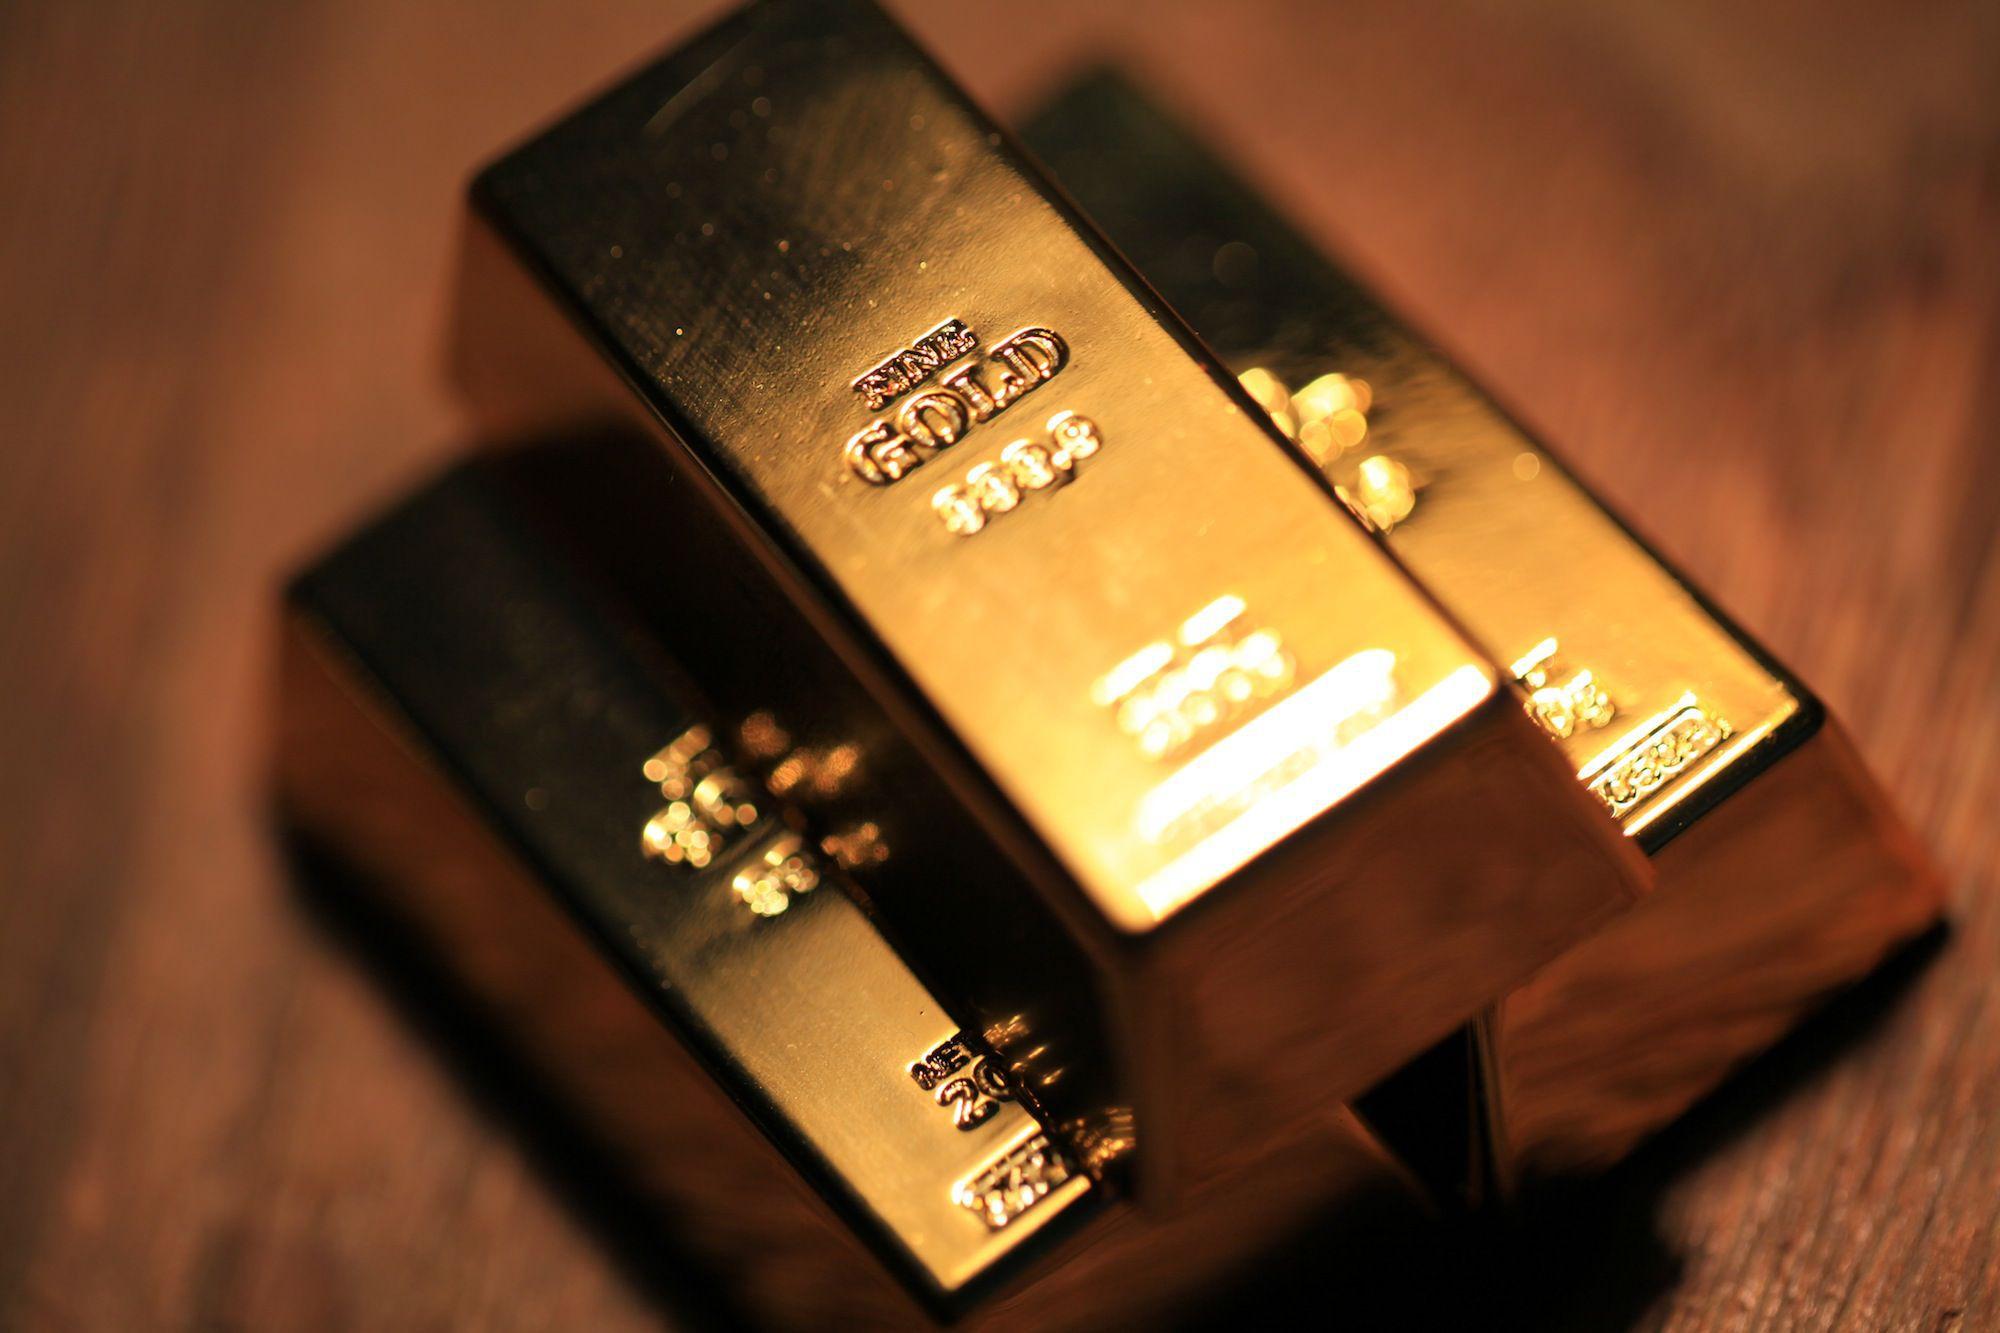 Futures Trading Broker / Online Commodity Broker / Online Future Trading